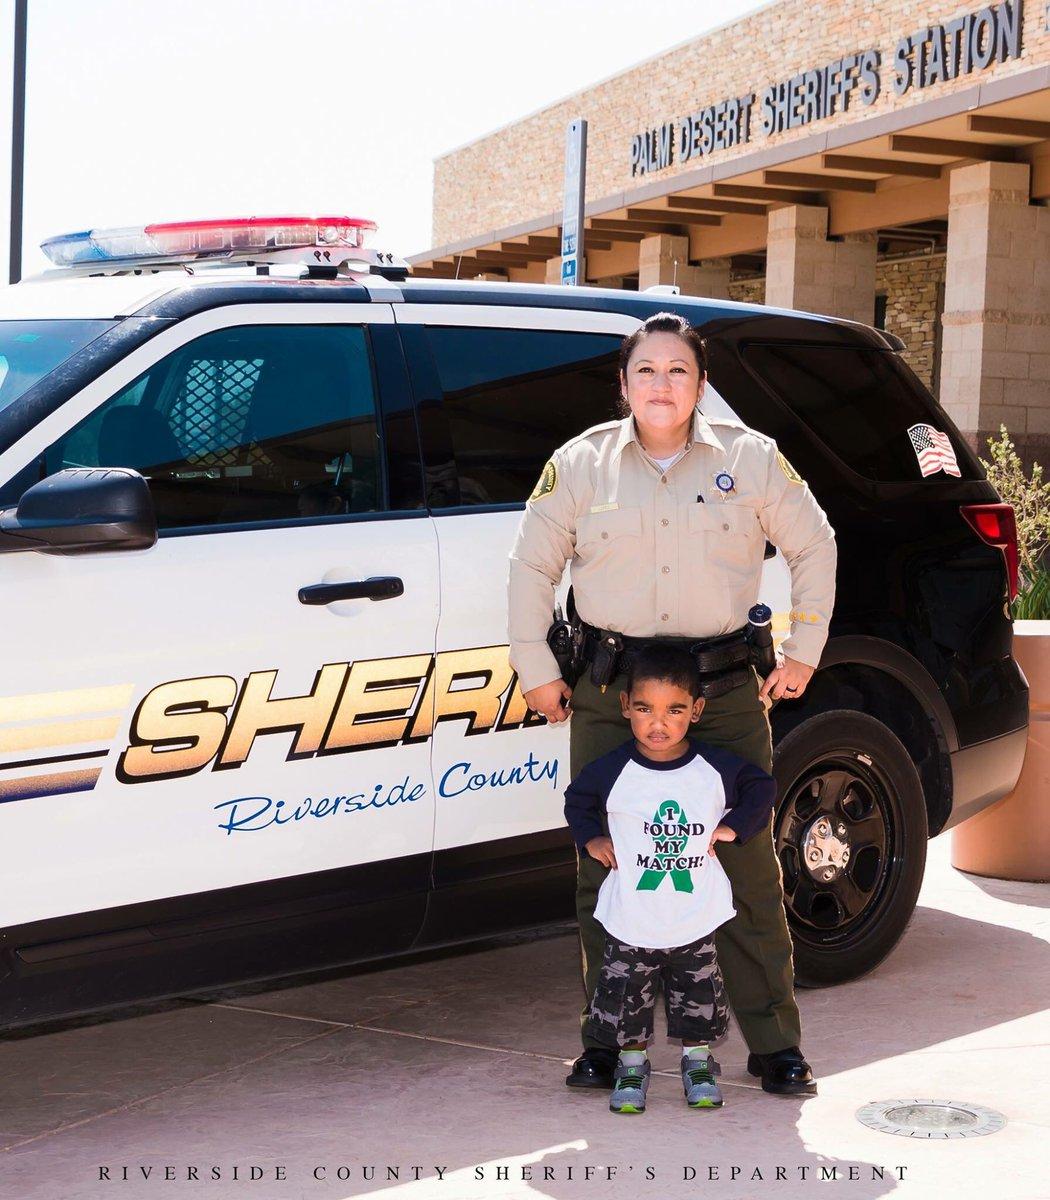 Riverside County Sheriff's Deputy Alicia Lopez will be donating her kidney to Matthew Castleberry Jr. ,3, the son of a former Deputy Sheriff.